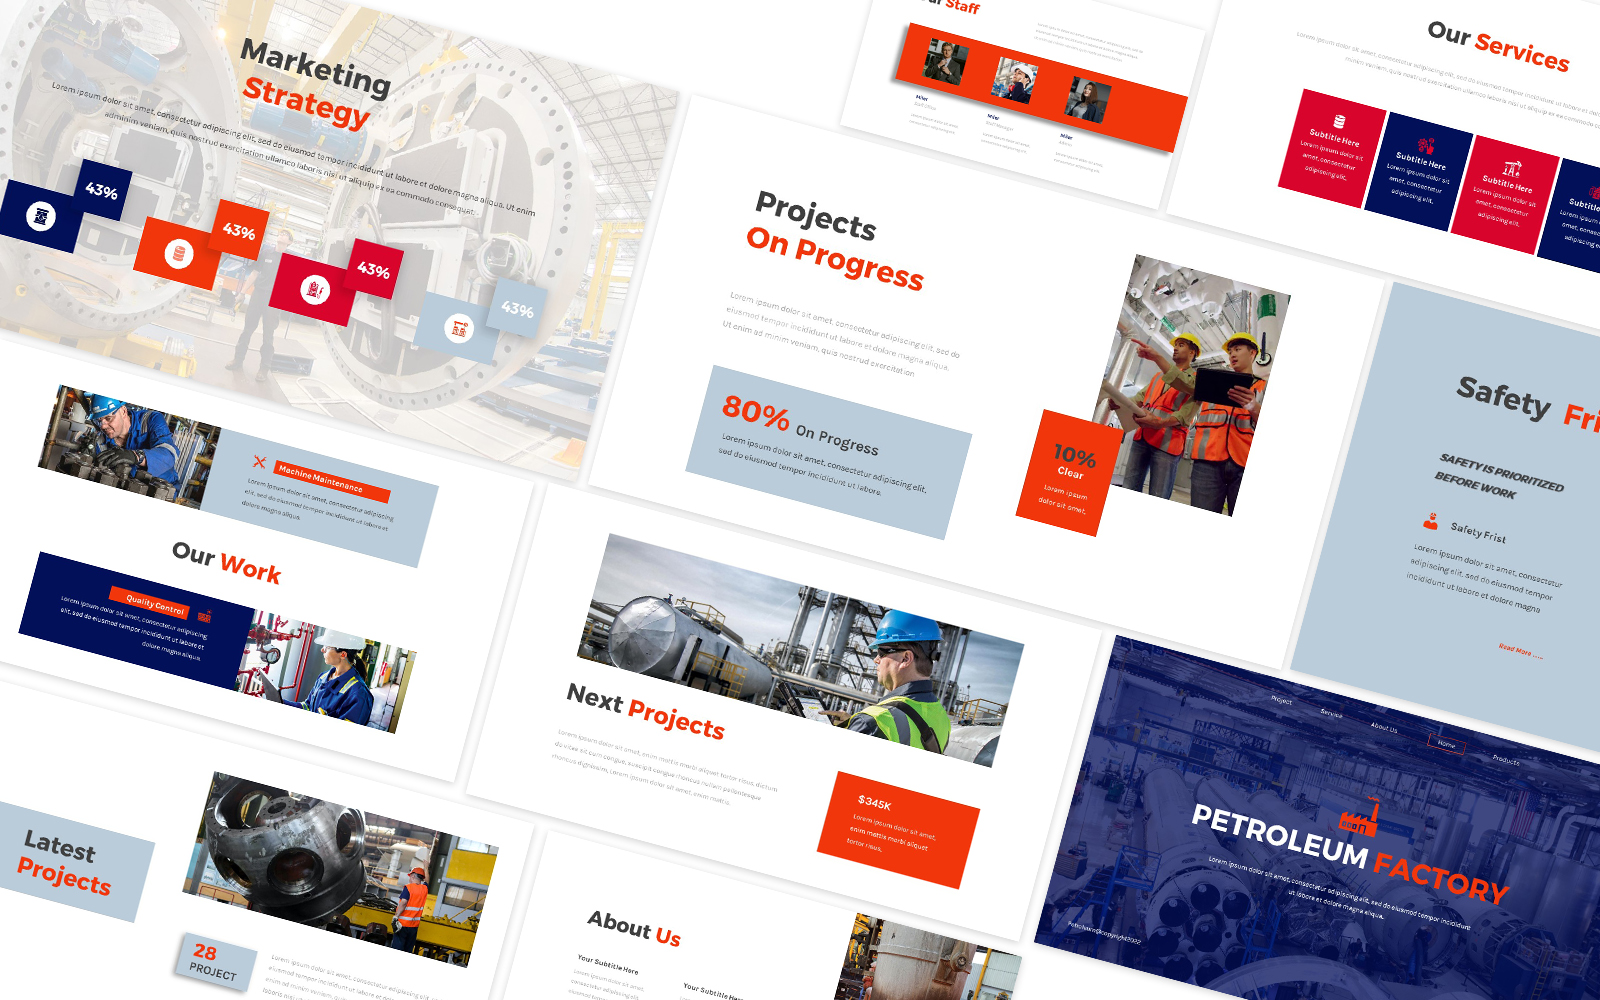 Petroleoum Factory Powerpoint Template